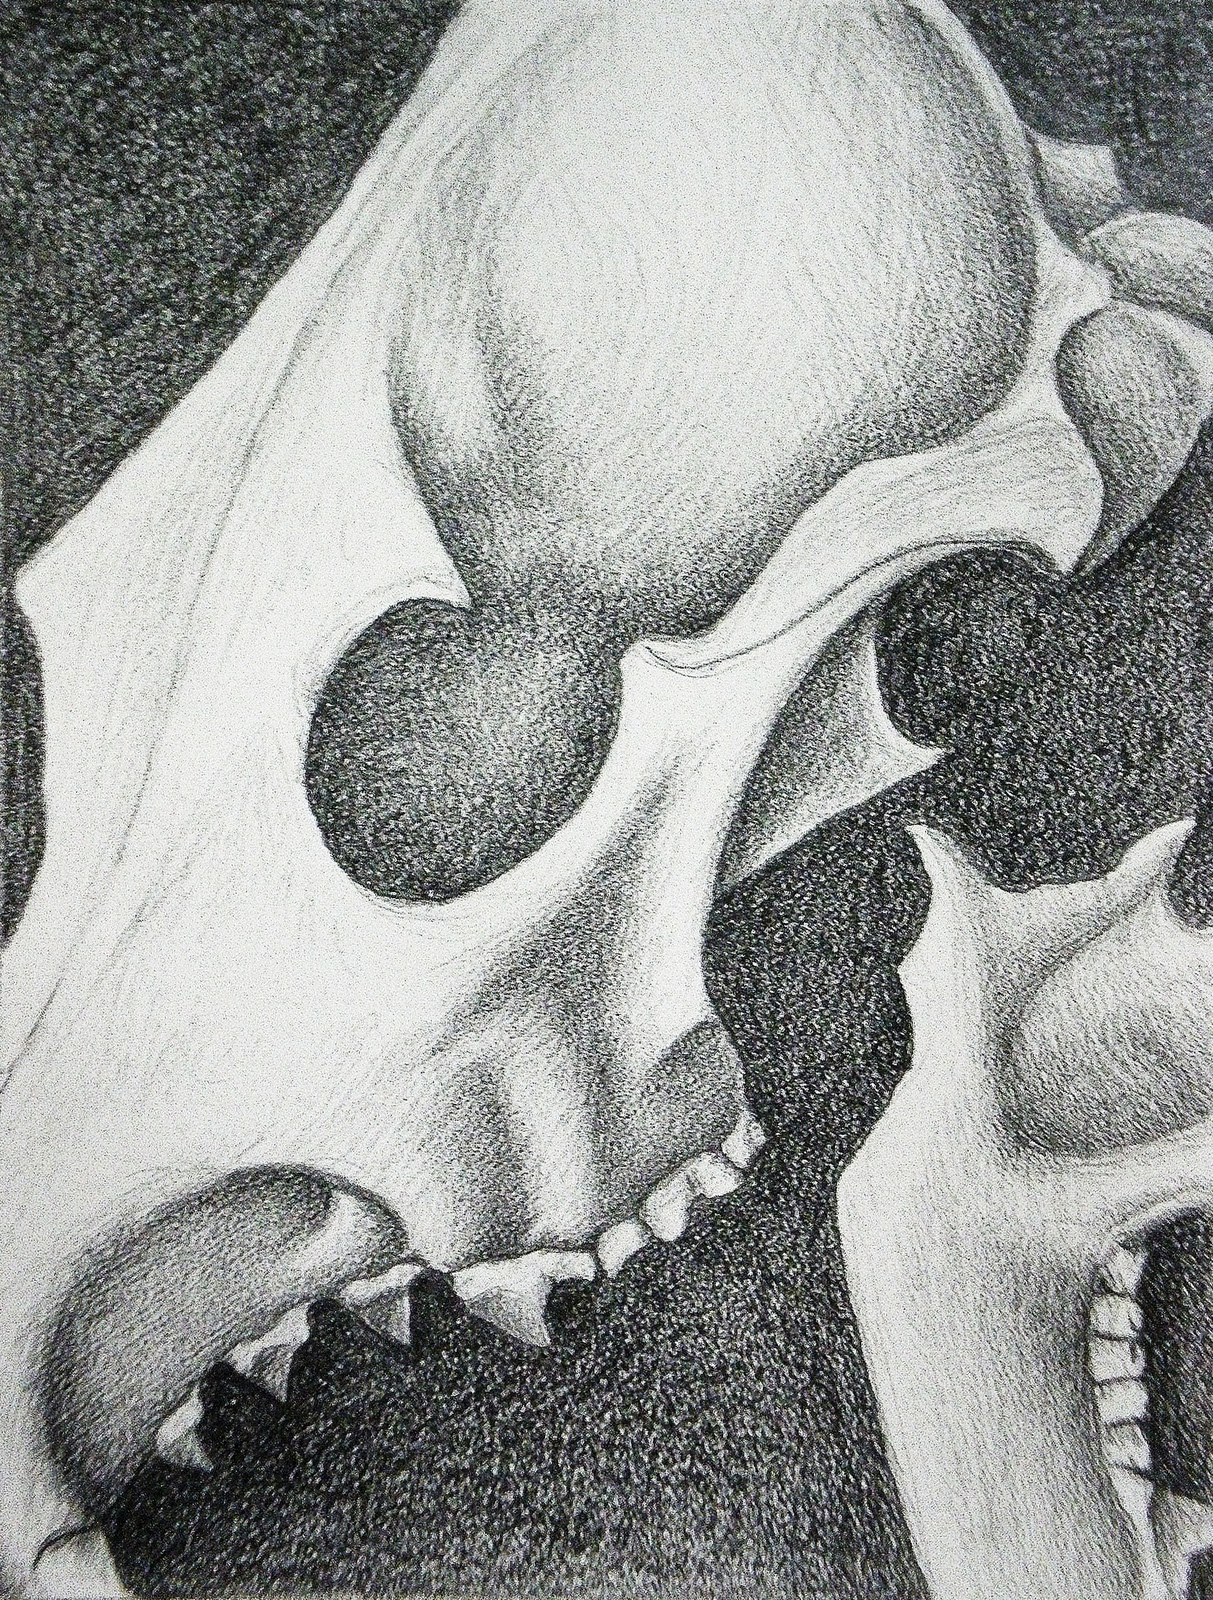 Coyote skull anatomy - photo#15